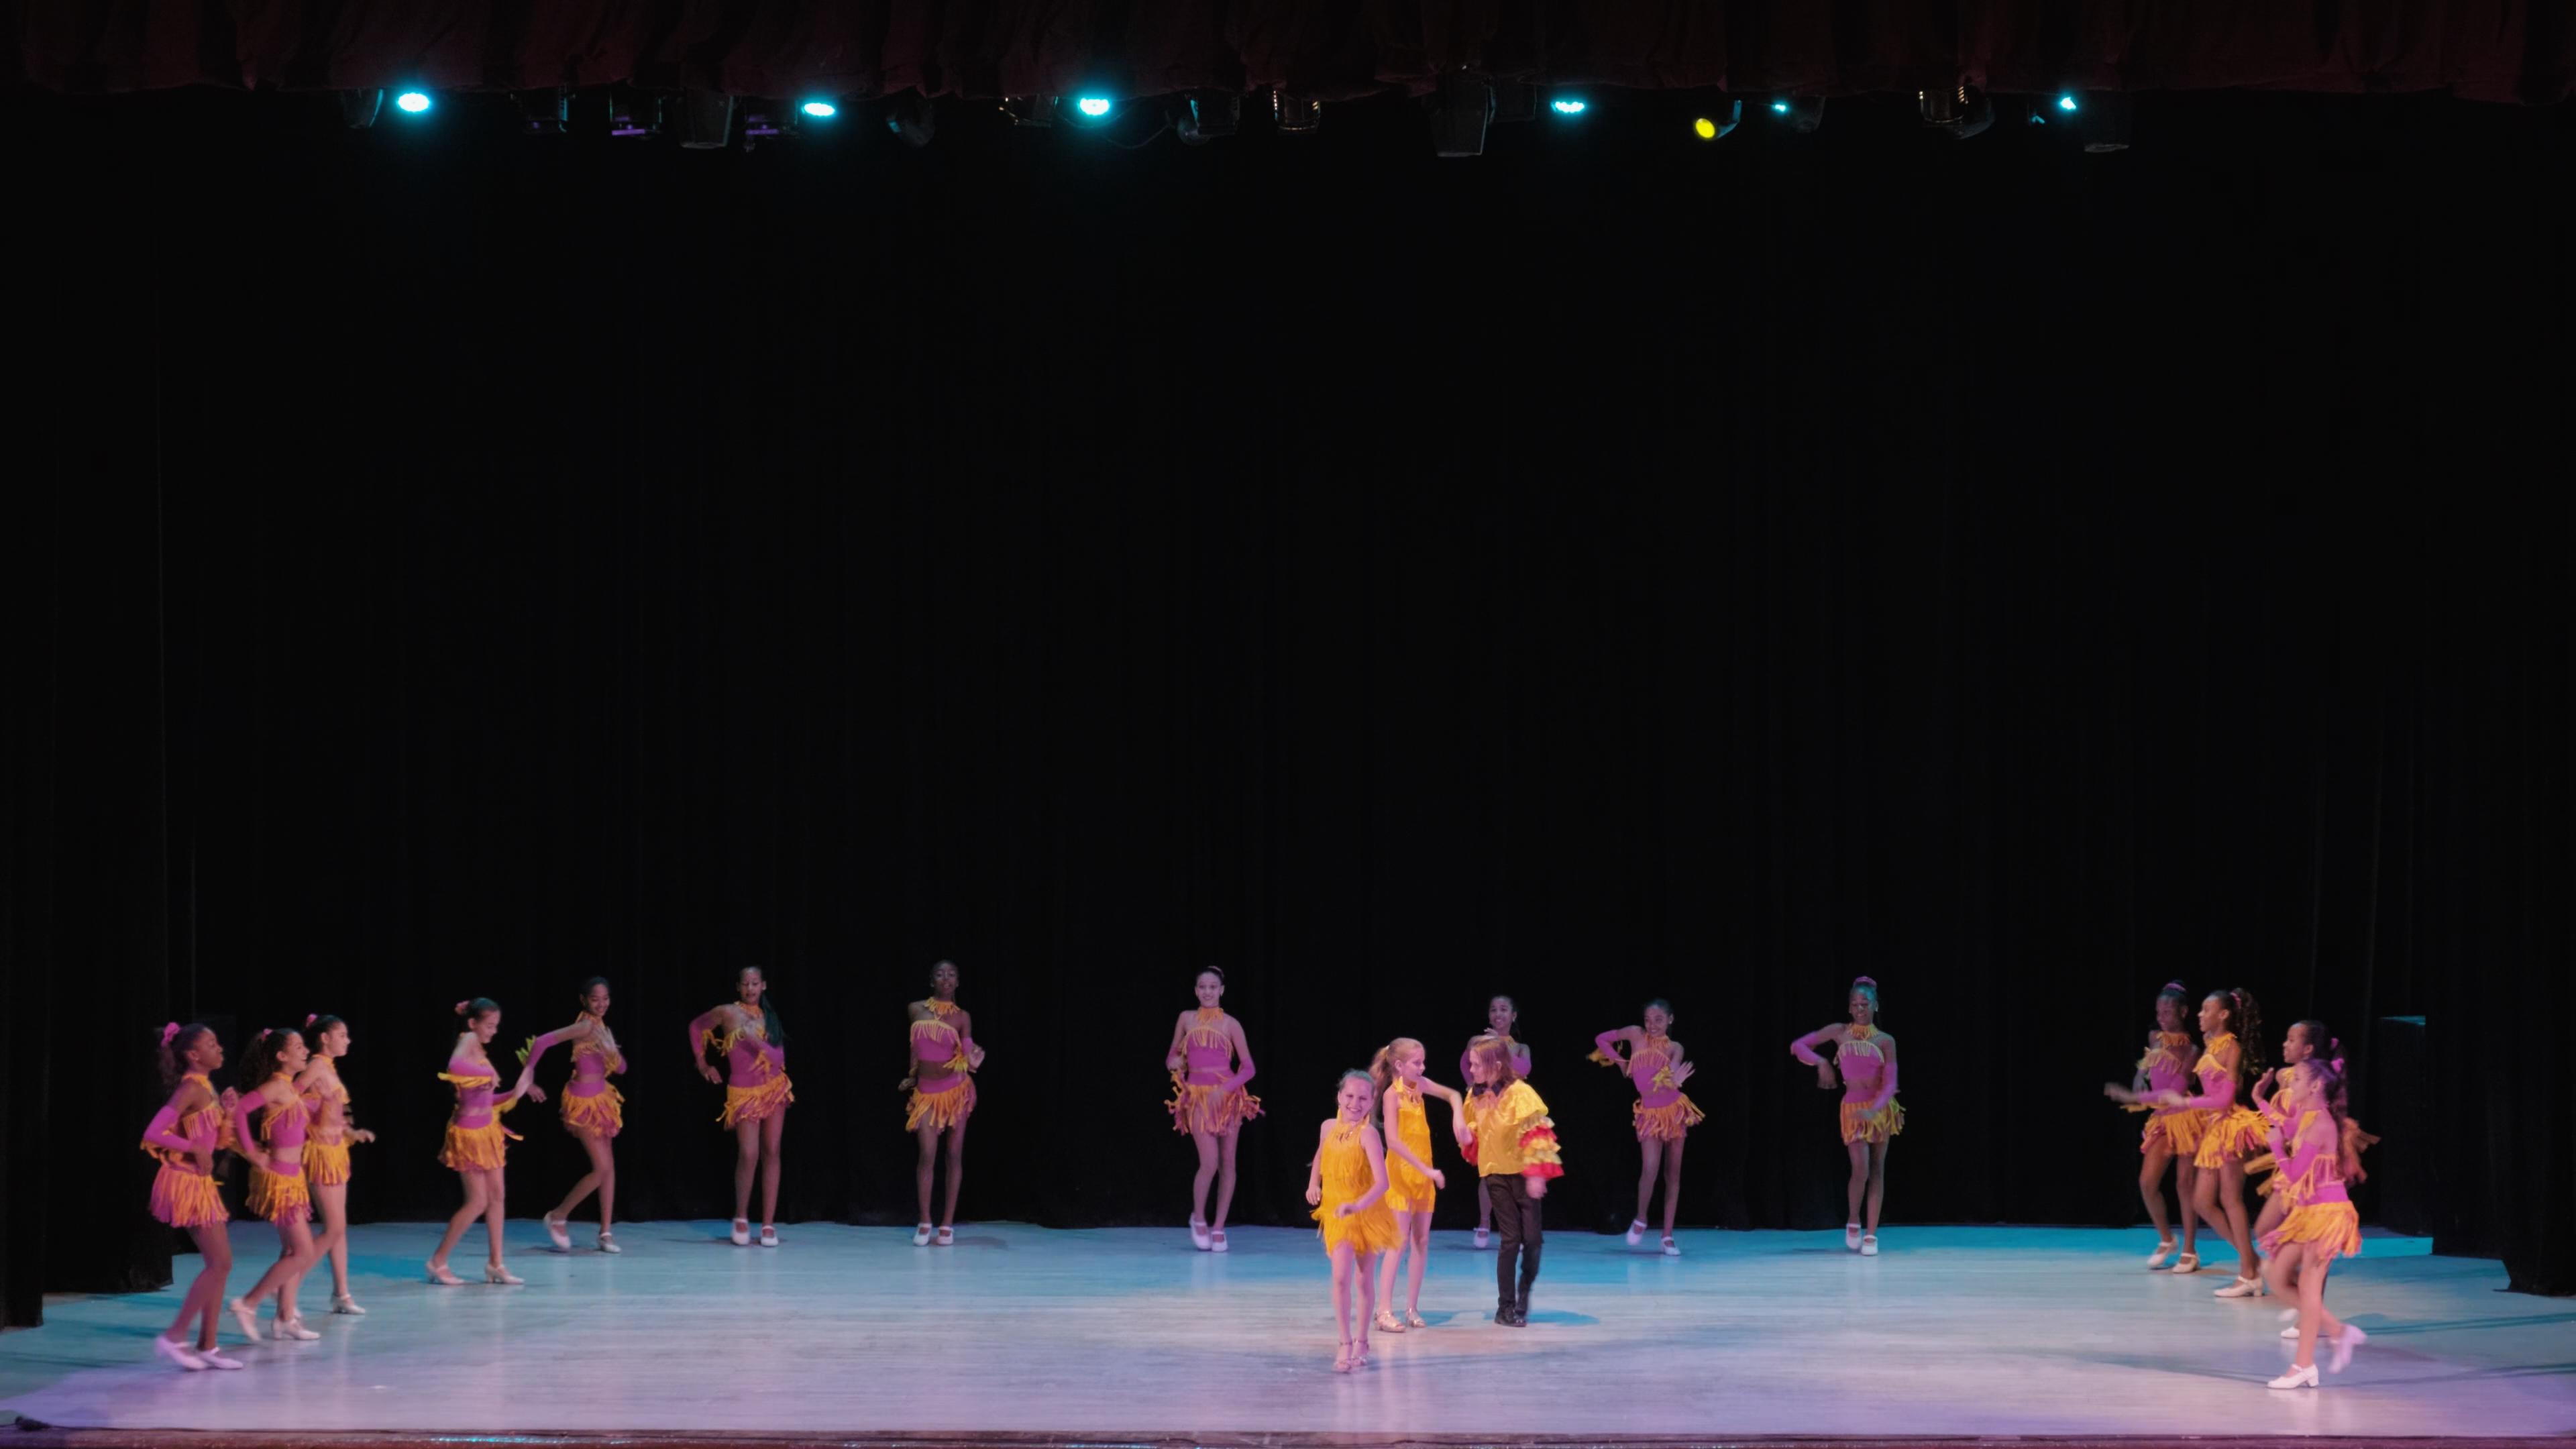 Teatro América. Salsa